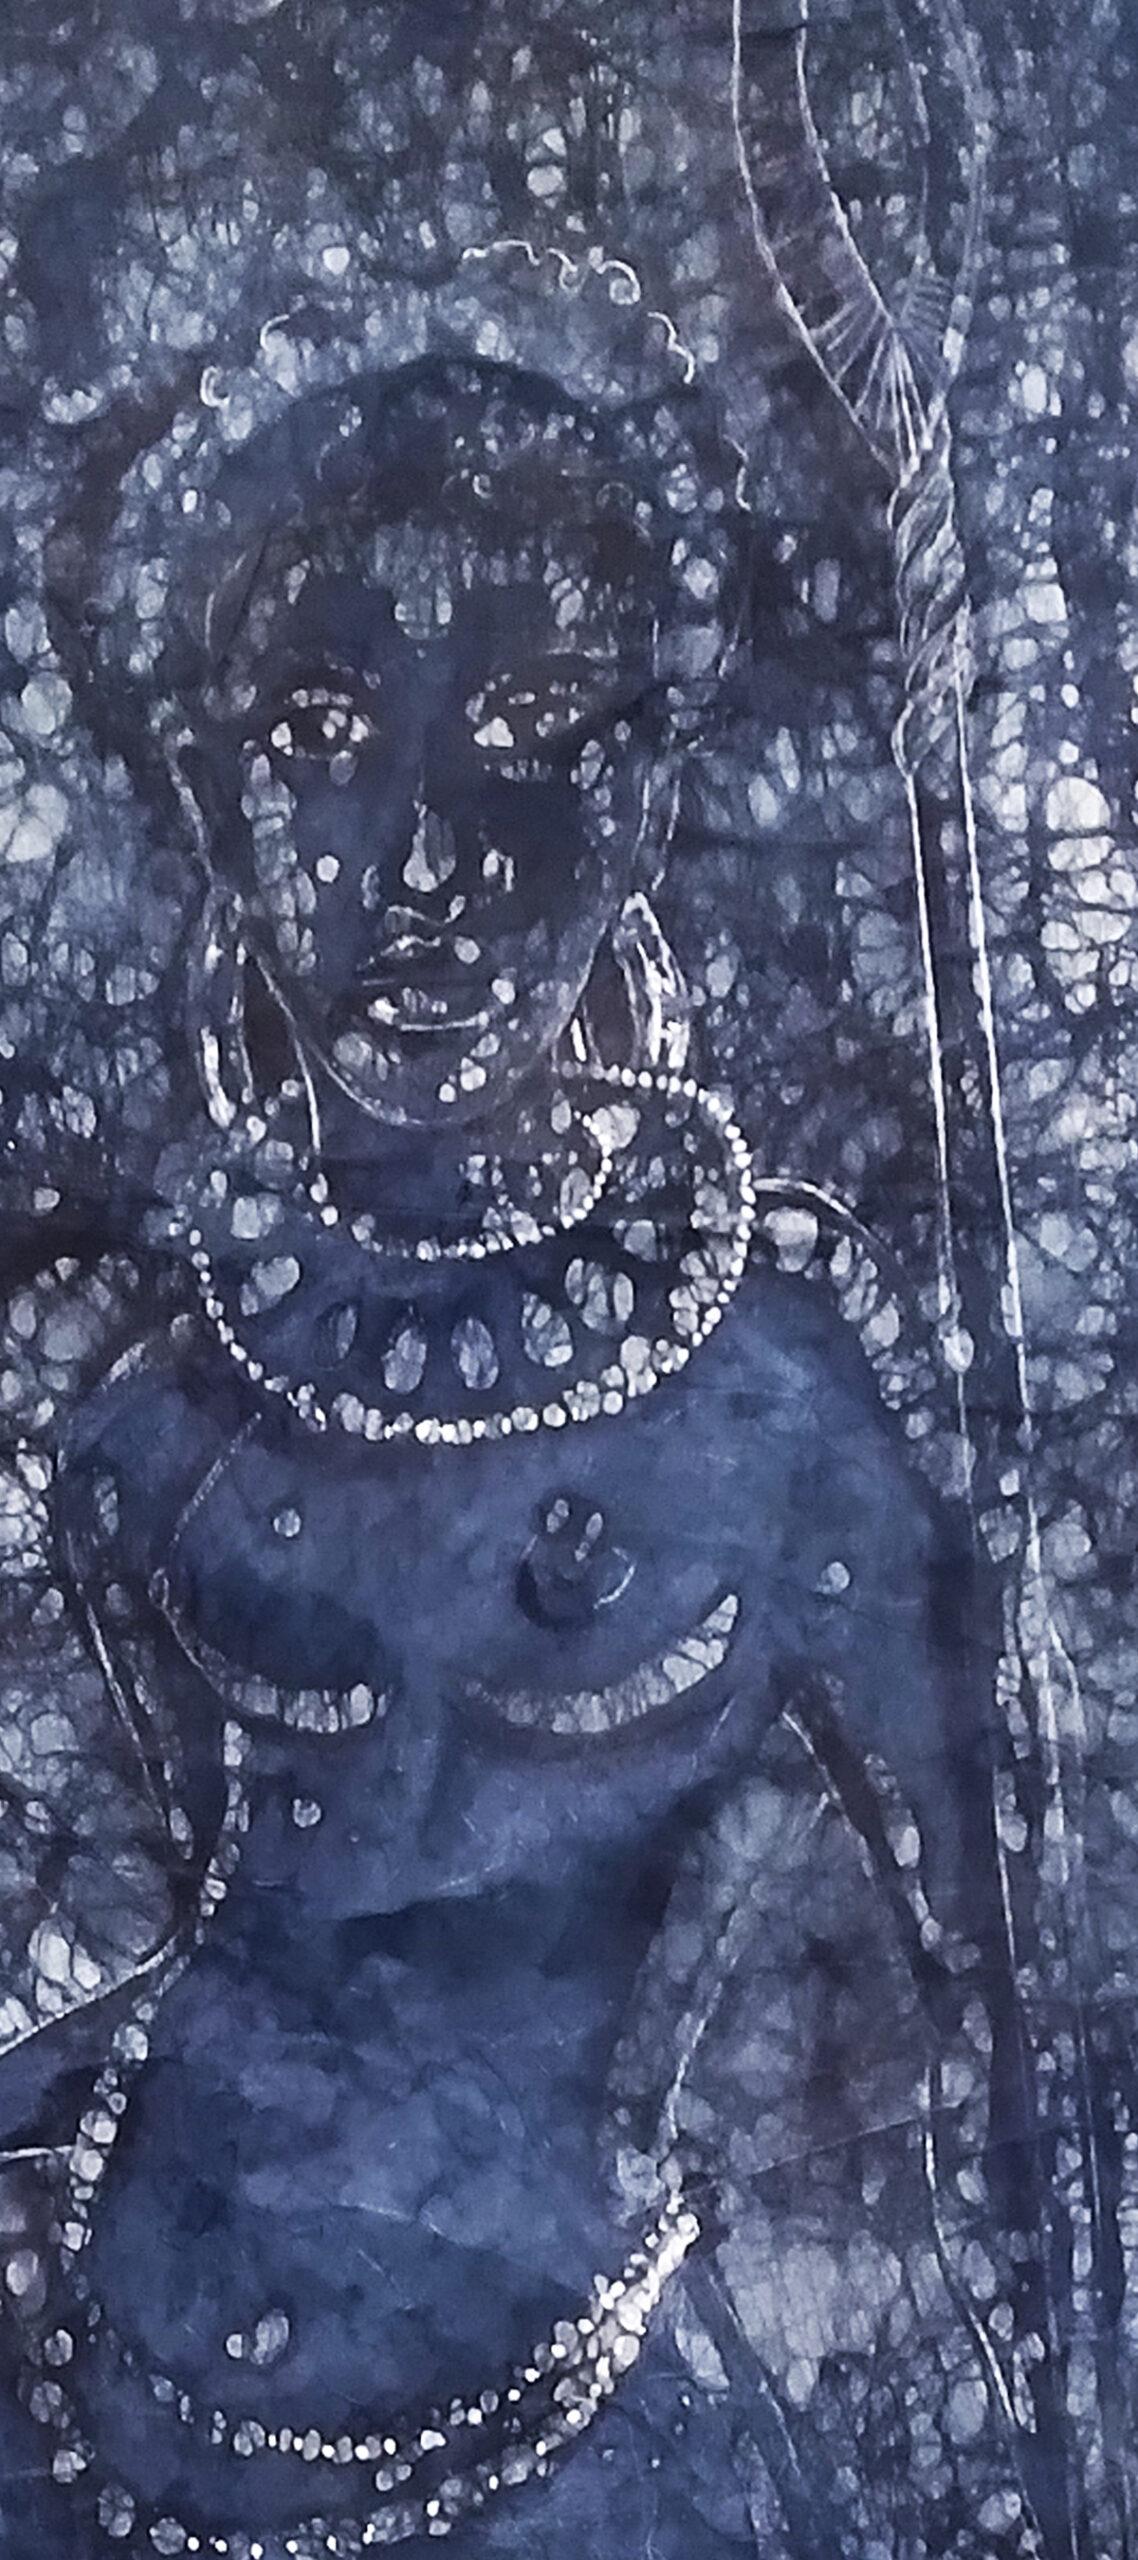 Osogbo Warrior detail